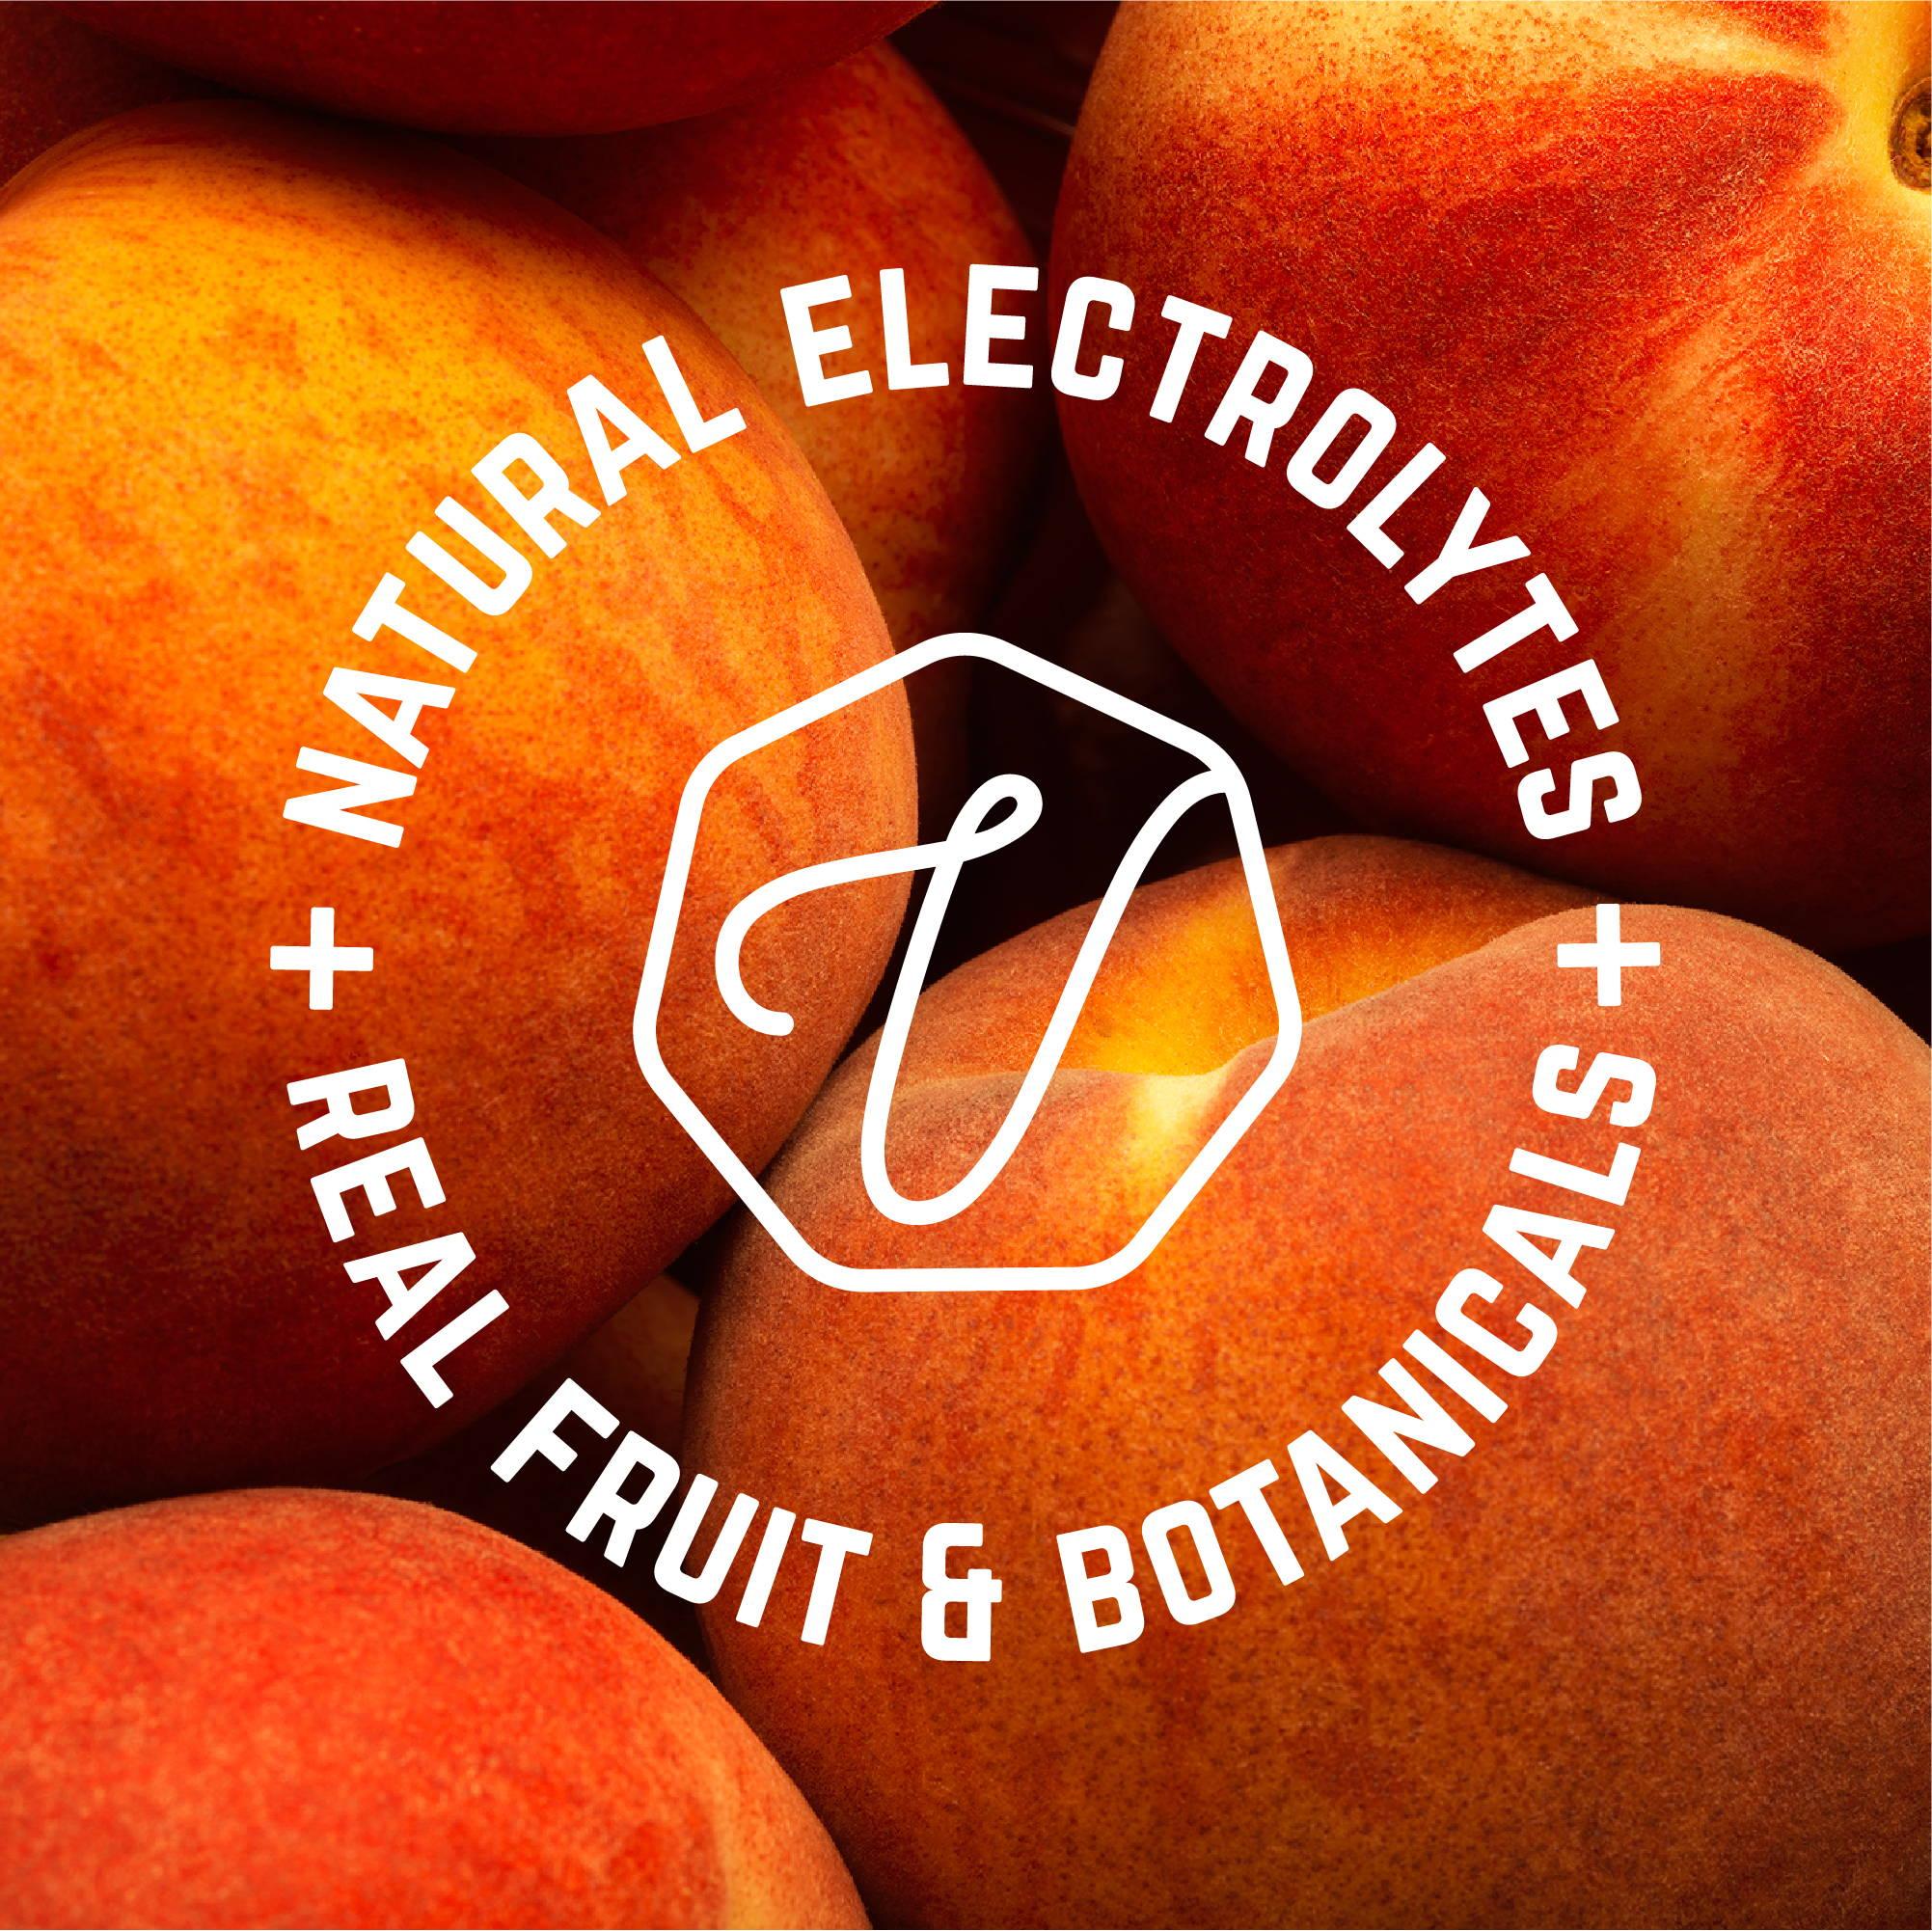 Veloforte Real Hydration | Natural Electrolytes | Real Fruit & Botanicals | Hydration Powders